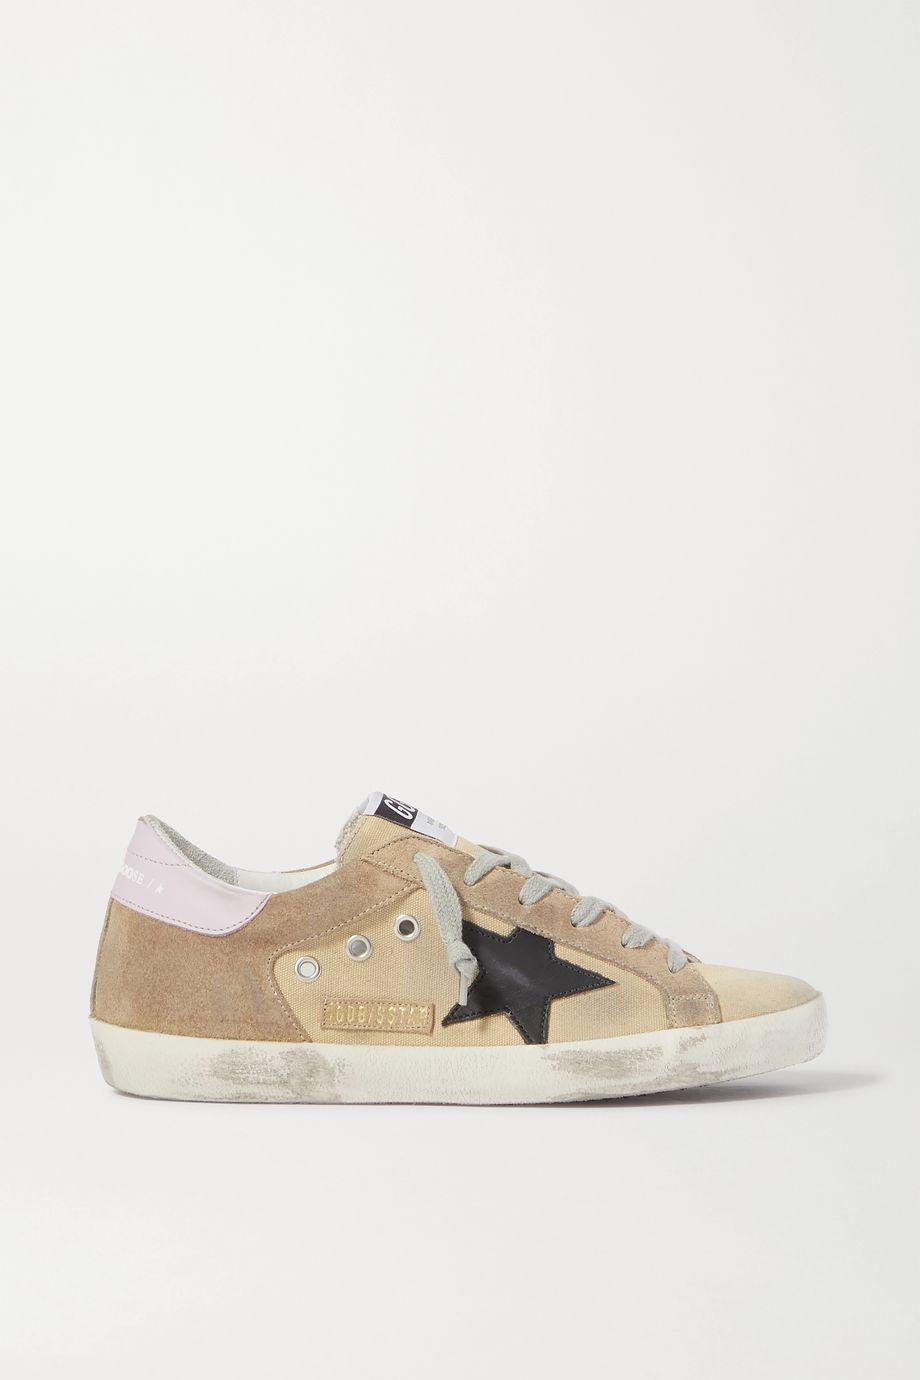 Golden Goose Superstar Sneakers aus Canvas und Veloursleder in Distressed-Optik